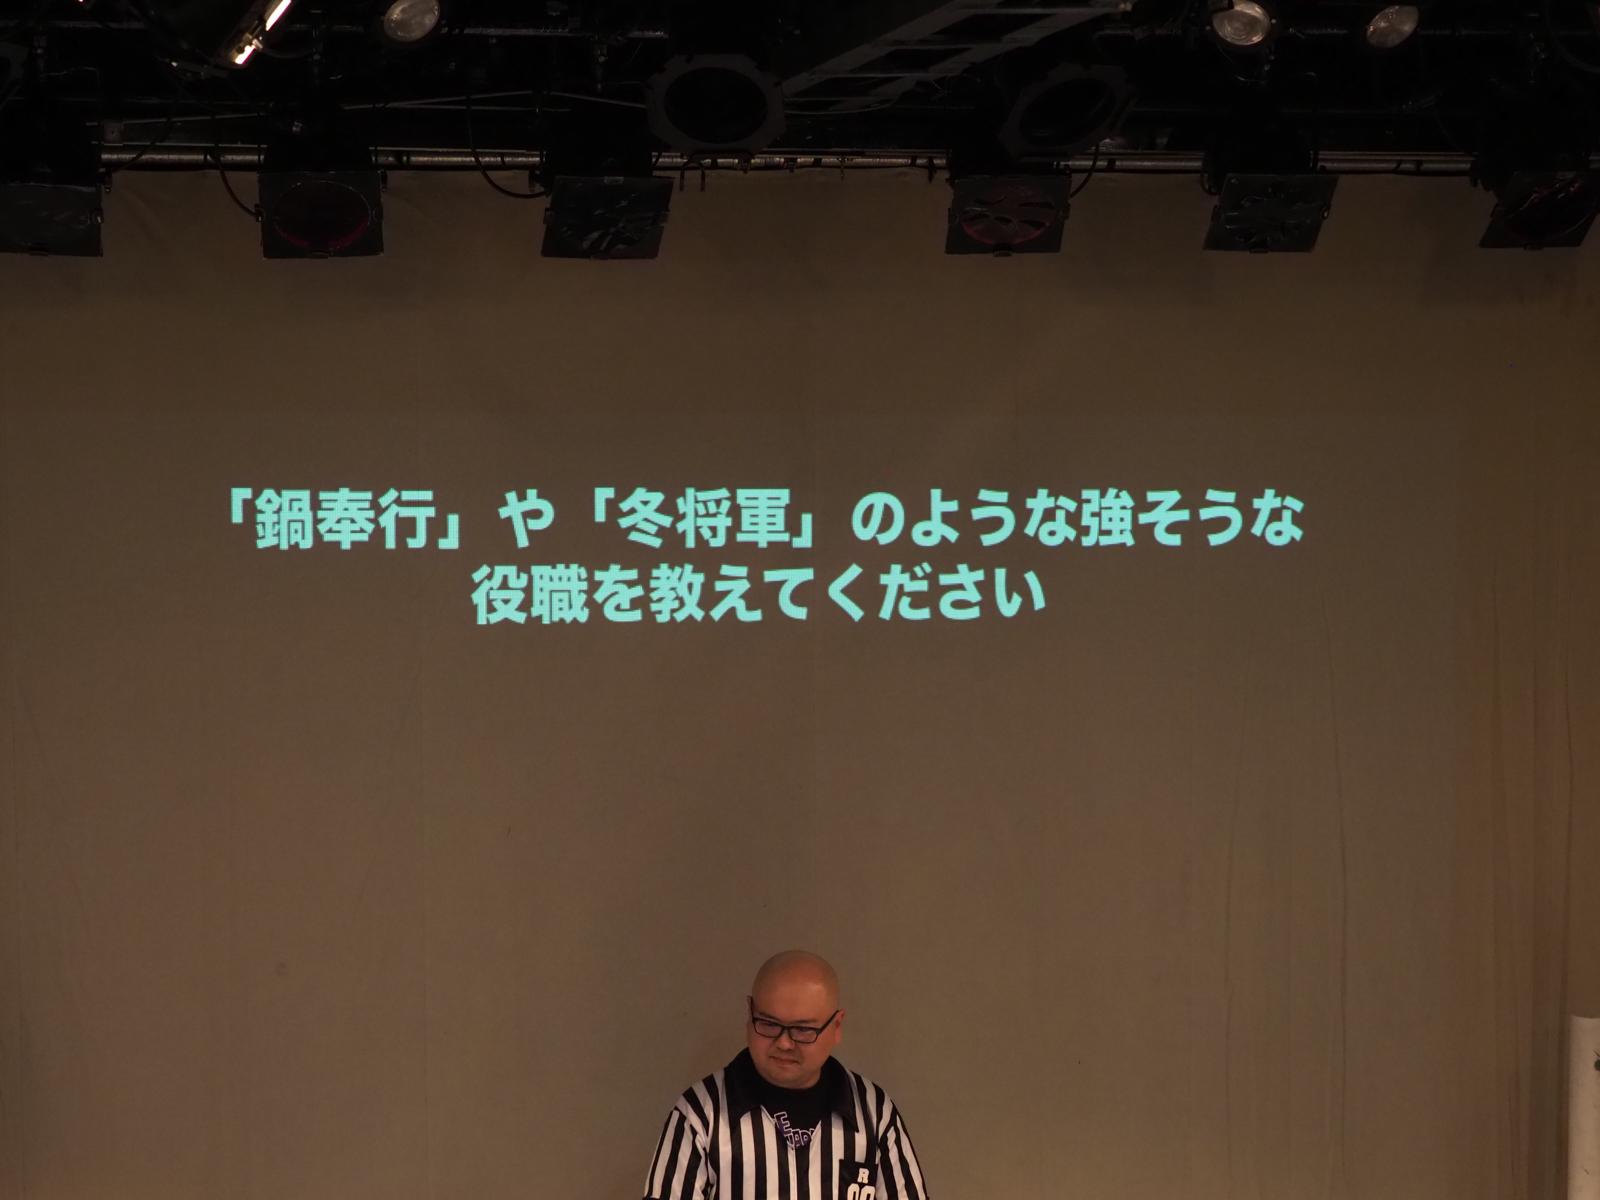 f:id:motomachi24:20170226182811j:plain